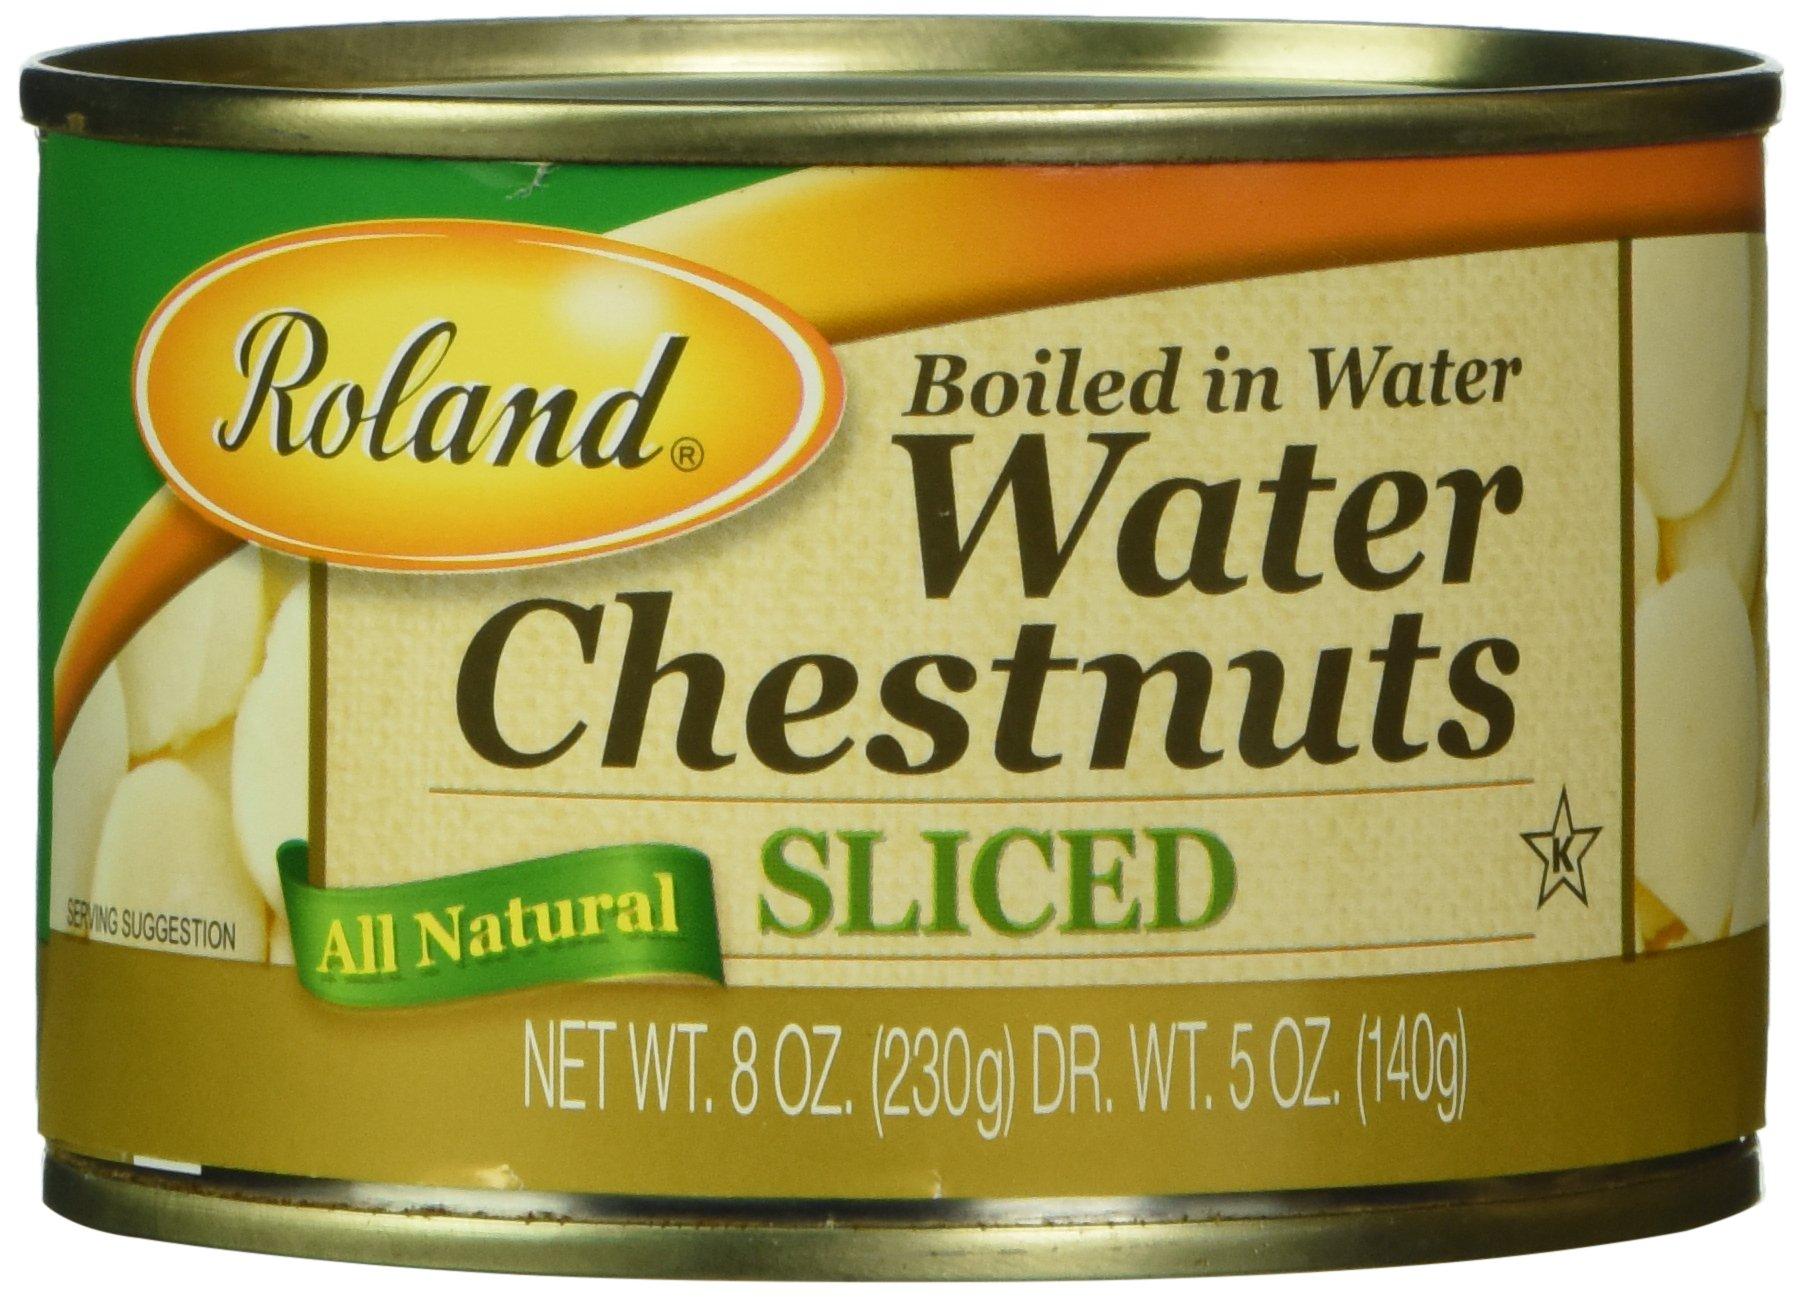 Roland Water Chestnuts, Sliced, 8 oz